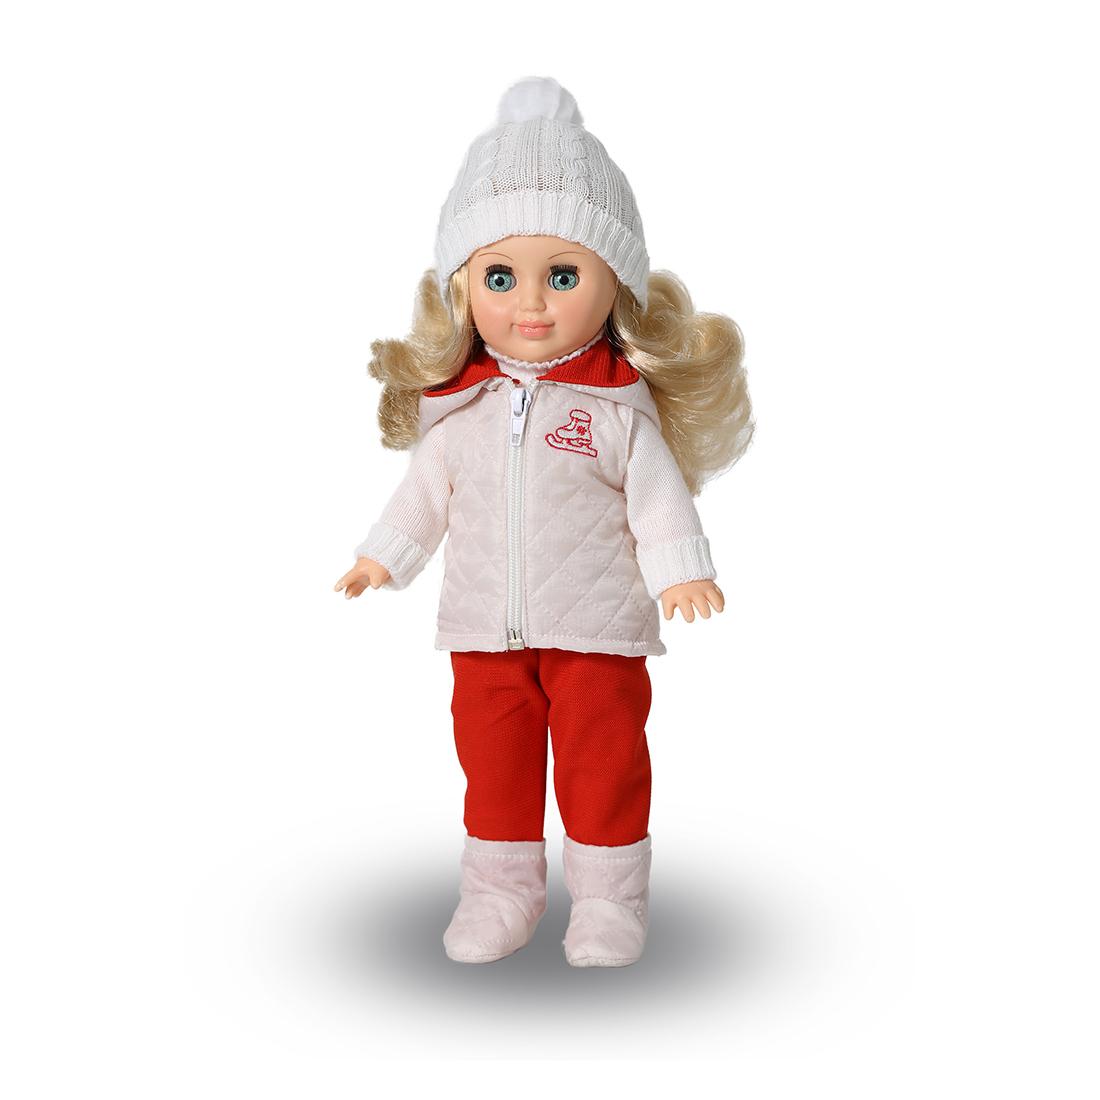 Кукла - Иринка 10, 37 смРусские куклы фабрики Весна<br>Кукла - Иринка 10, 37 см<br>